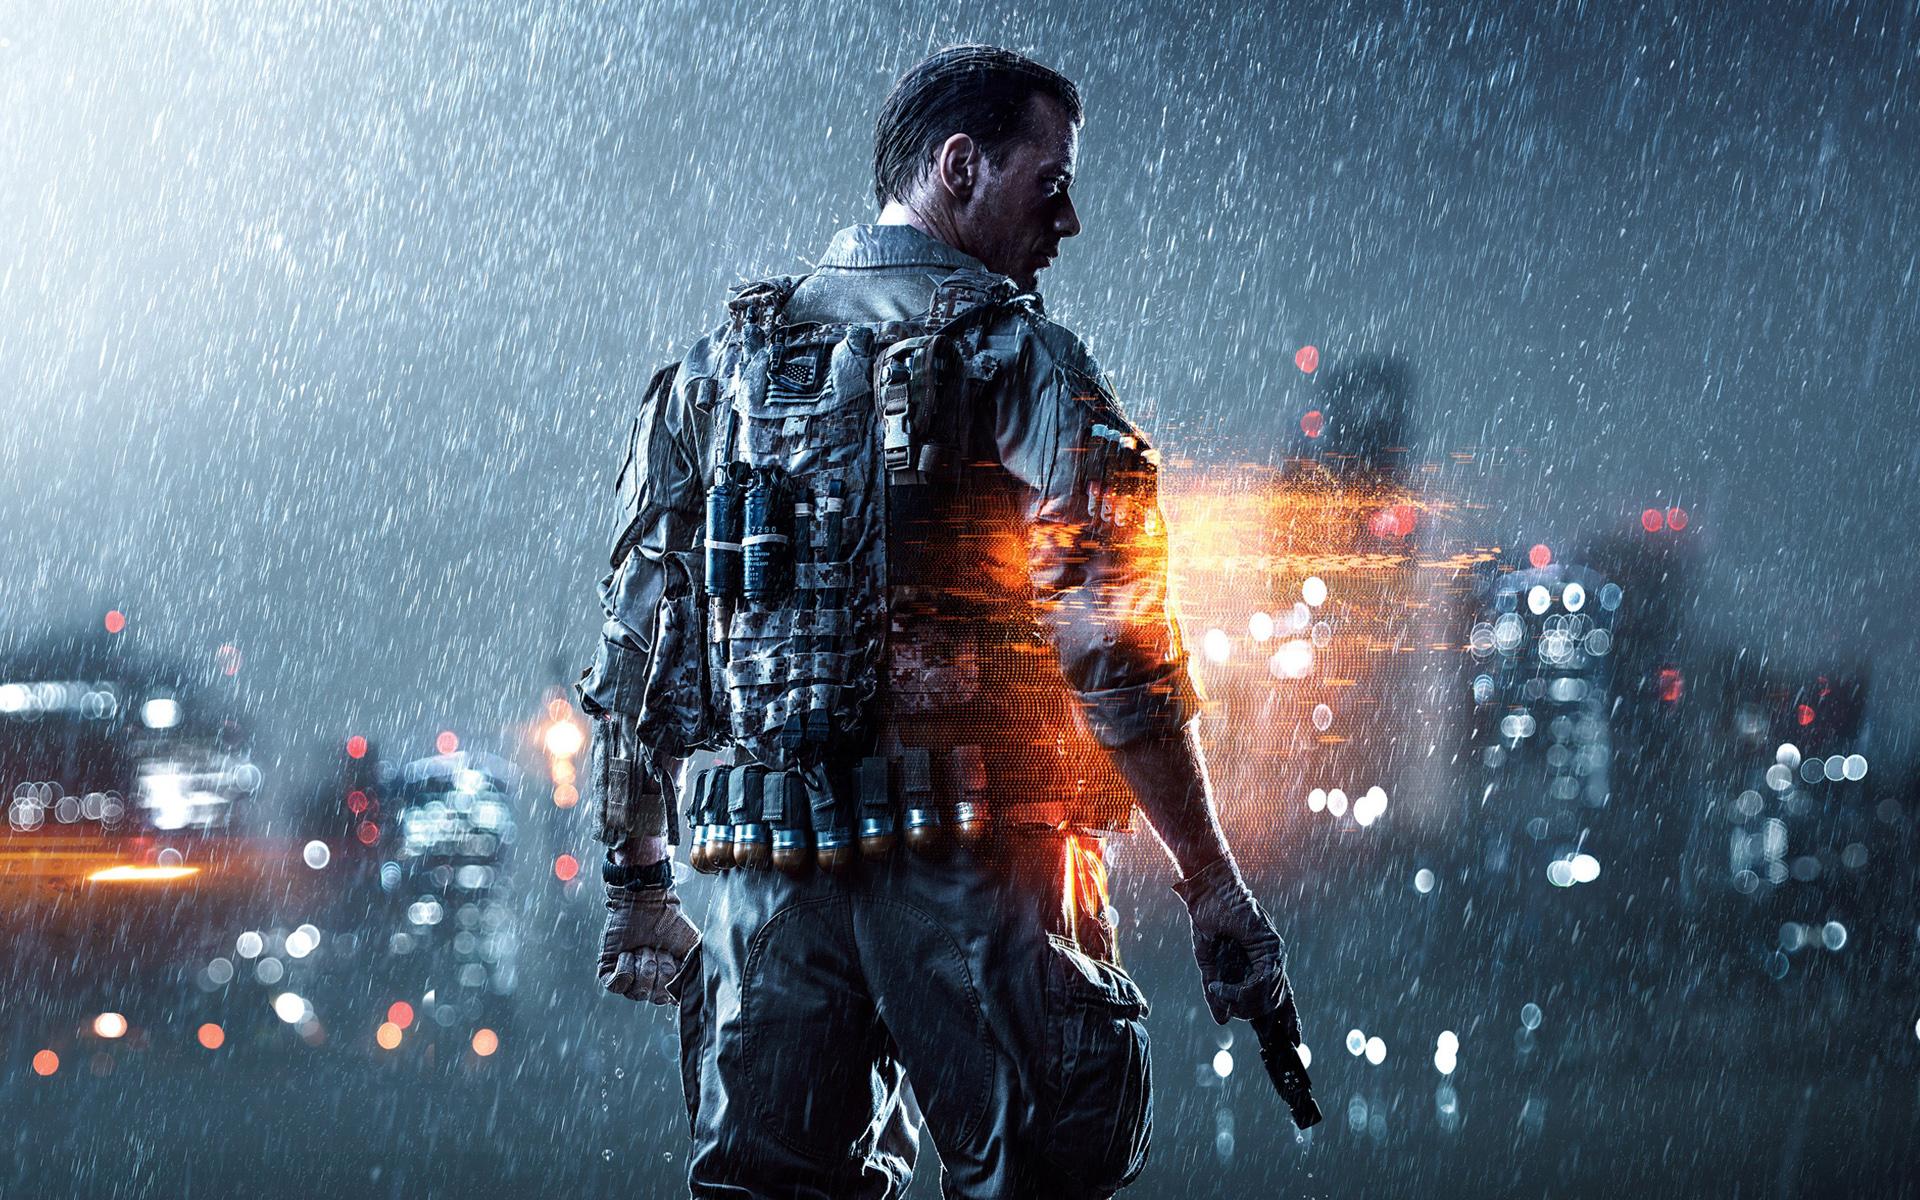 HD Wallpapers Battlefield 4 Game